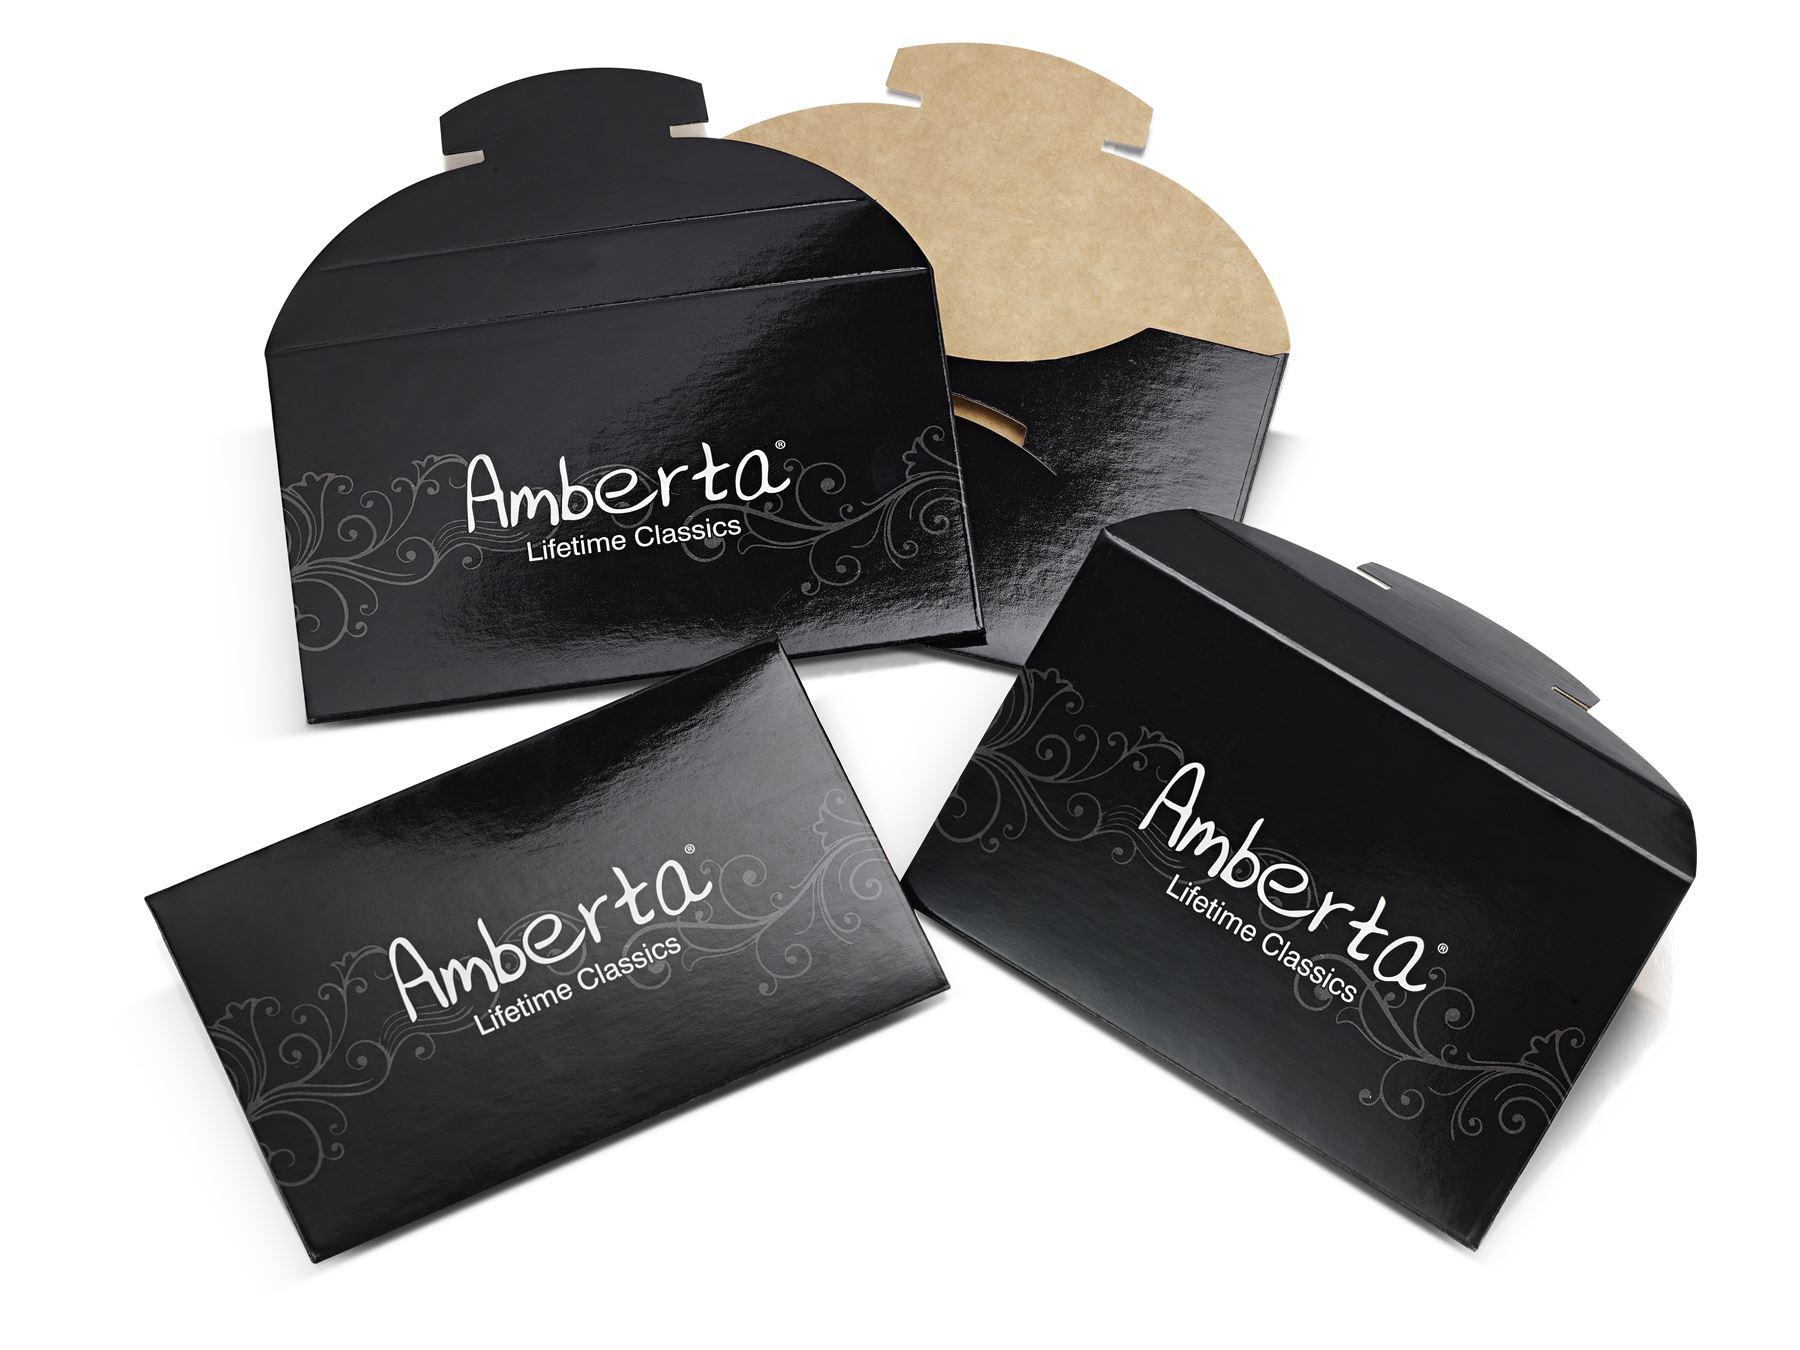 Amberta-Jewelry-925-Sterling-Silver-Adjustable-Bracelet-Italian-Bangle-for-Women thumbnail 49